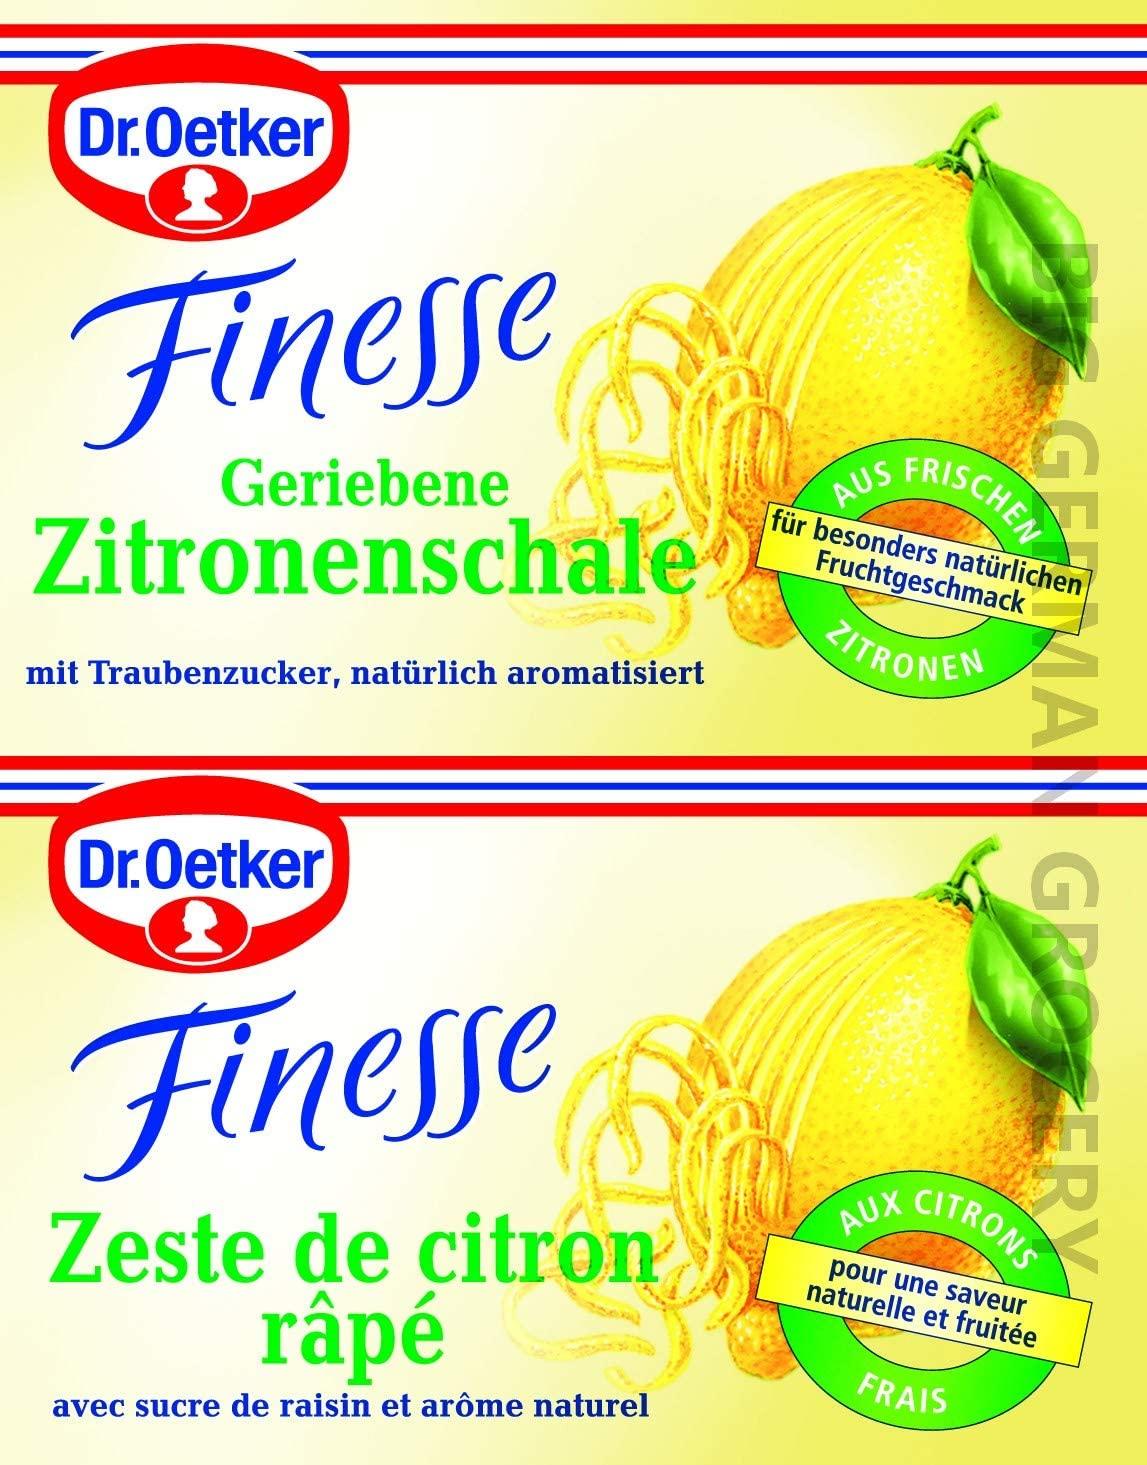 Dr. Oetker Finesse Geriebene Zitronenschale (grated lemon zest)